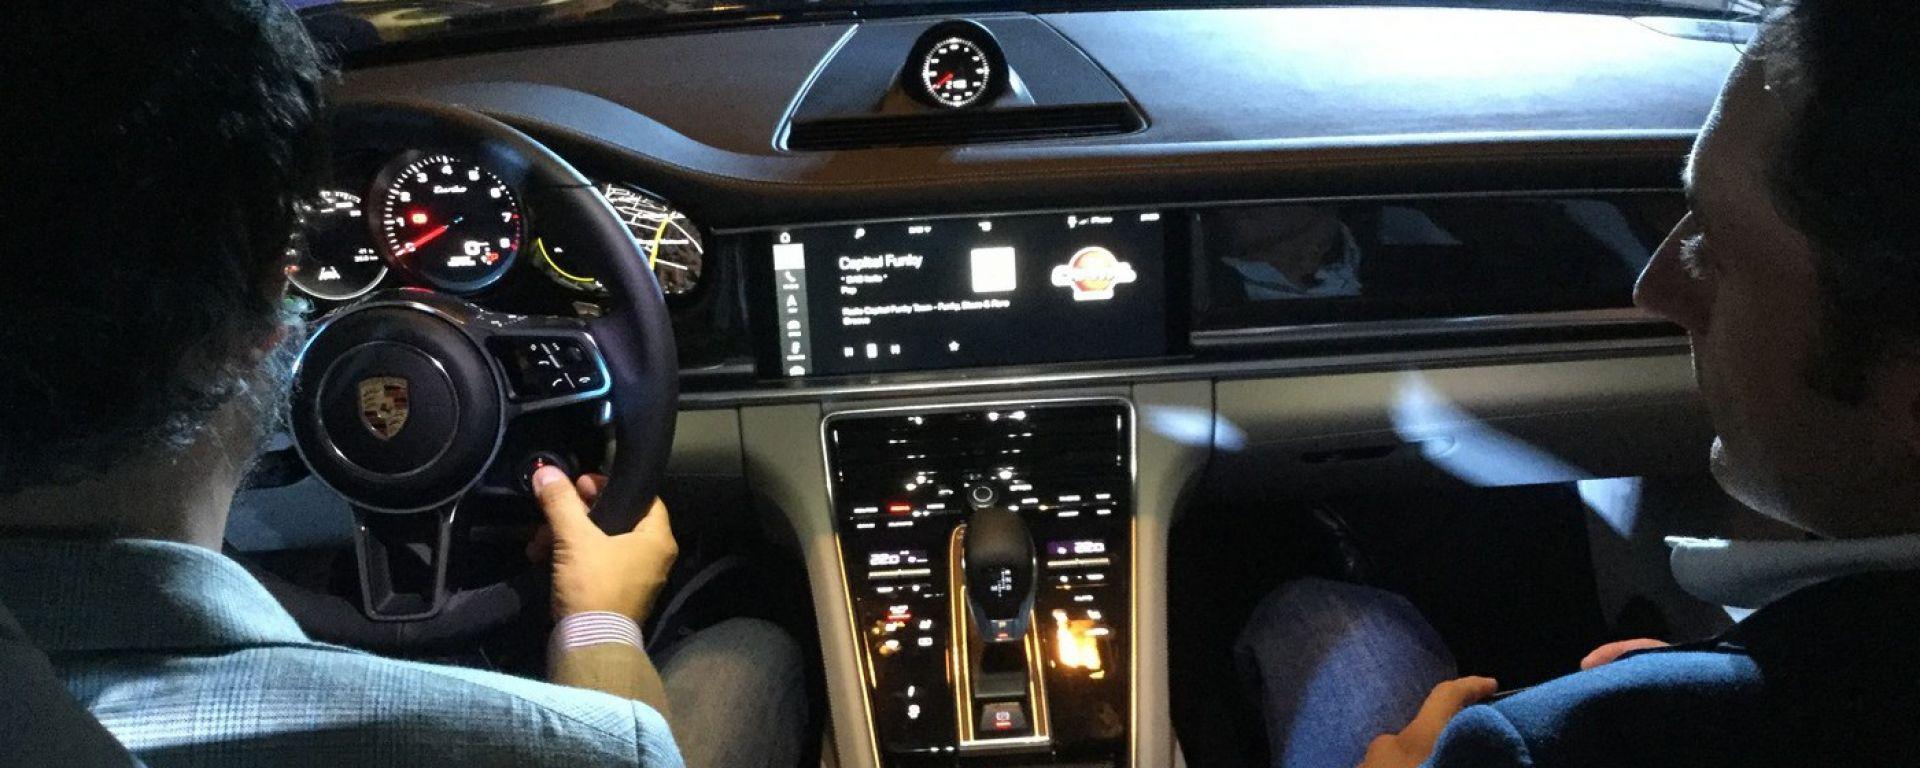 Nuova Porsche Panamera 2017: saltiamoci dentro